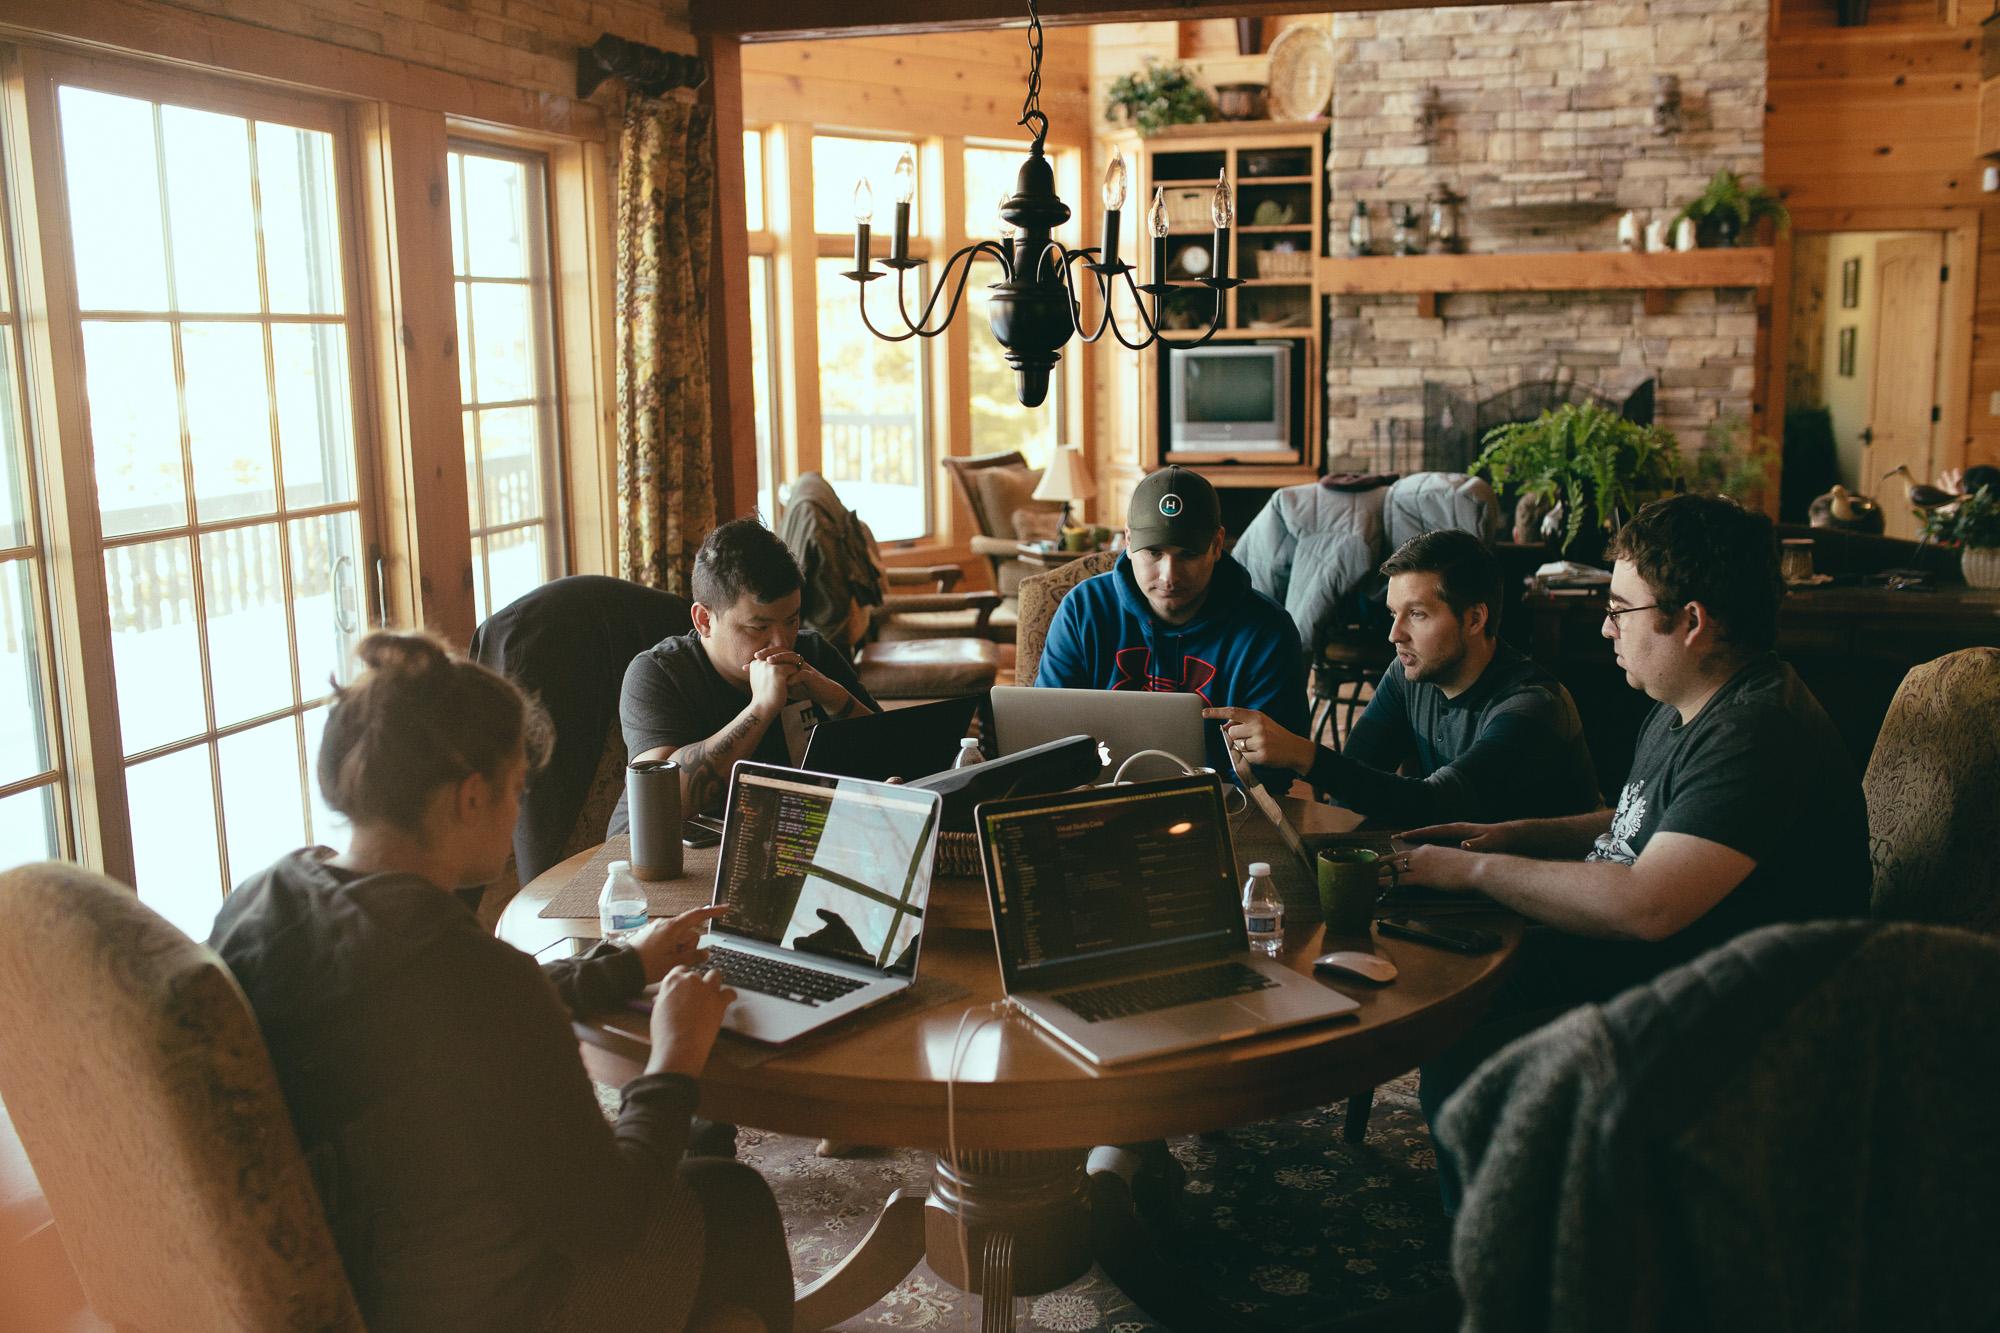 Group work around table